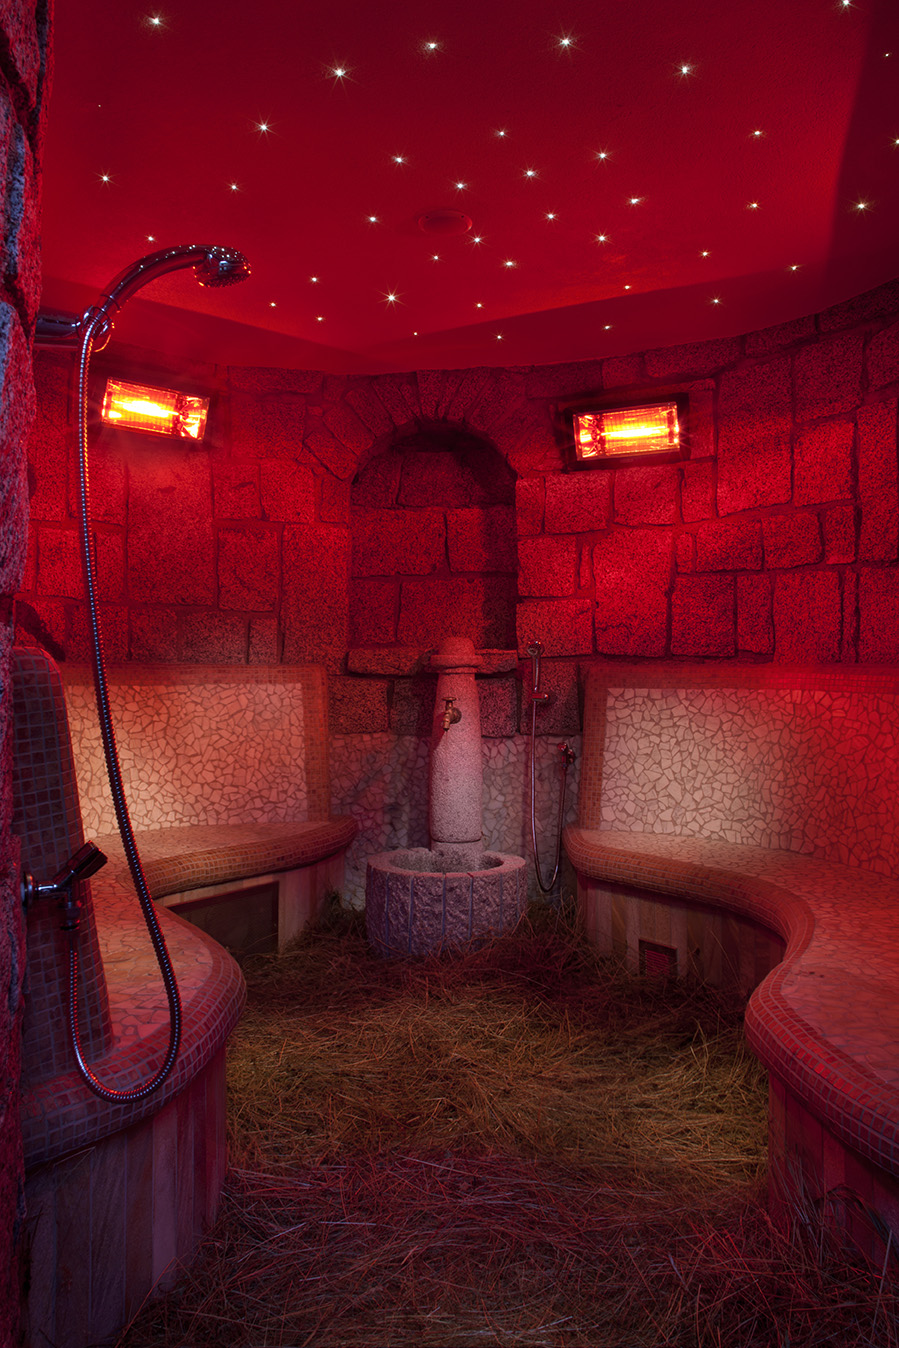 Immagine di testata per Grotta tepidarium del Parco